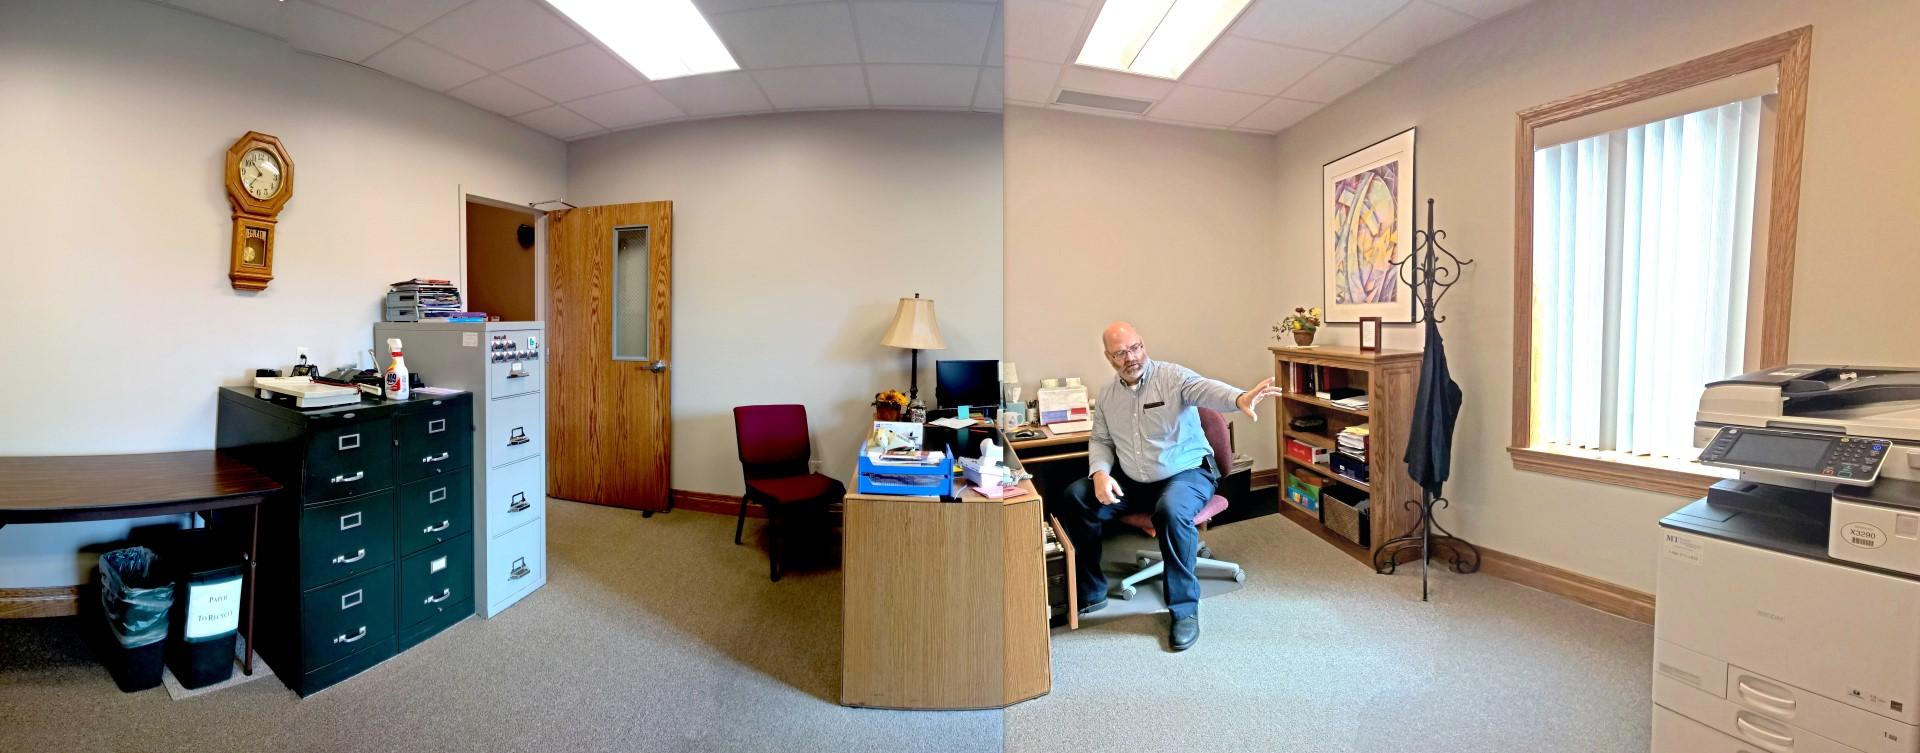 Jenera Office Panorama_B (Large).jpg